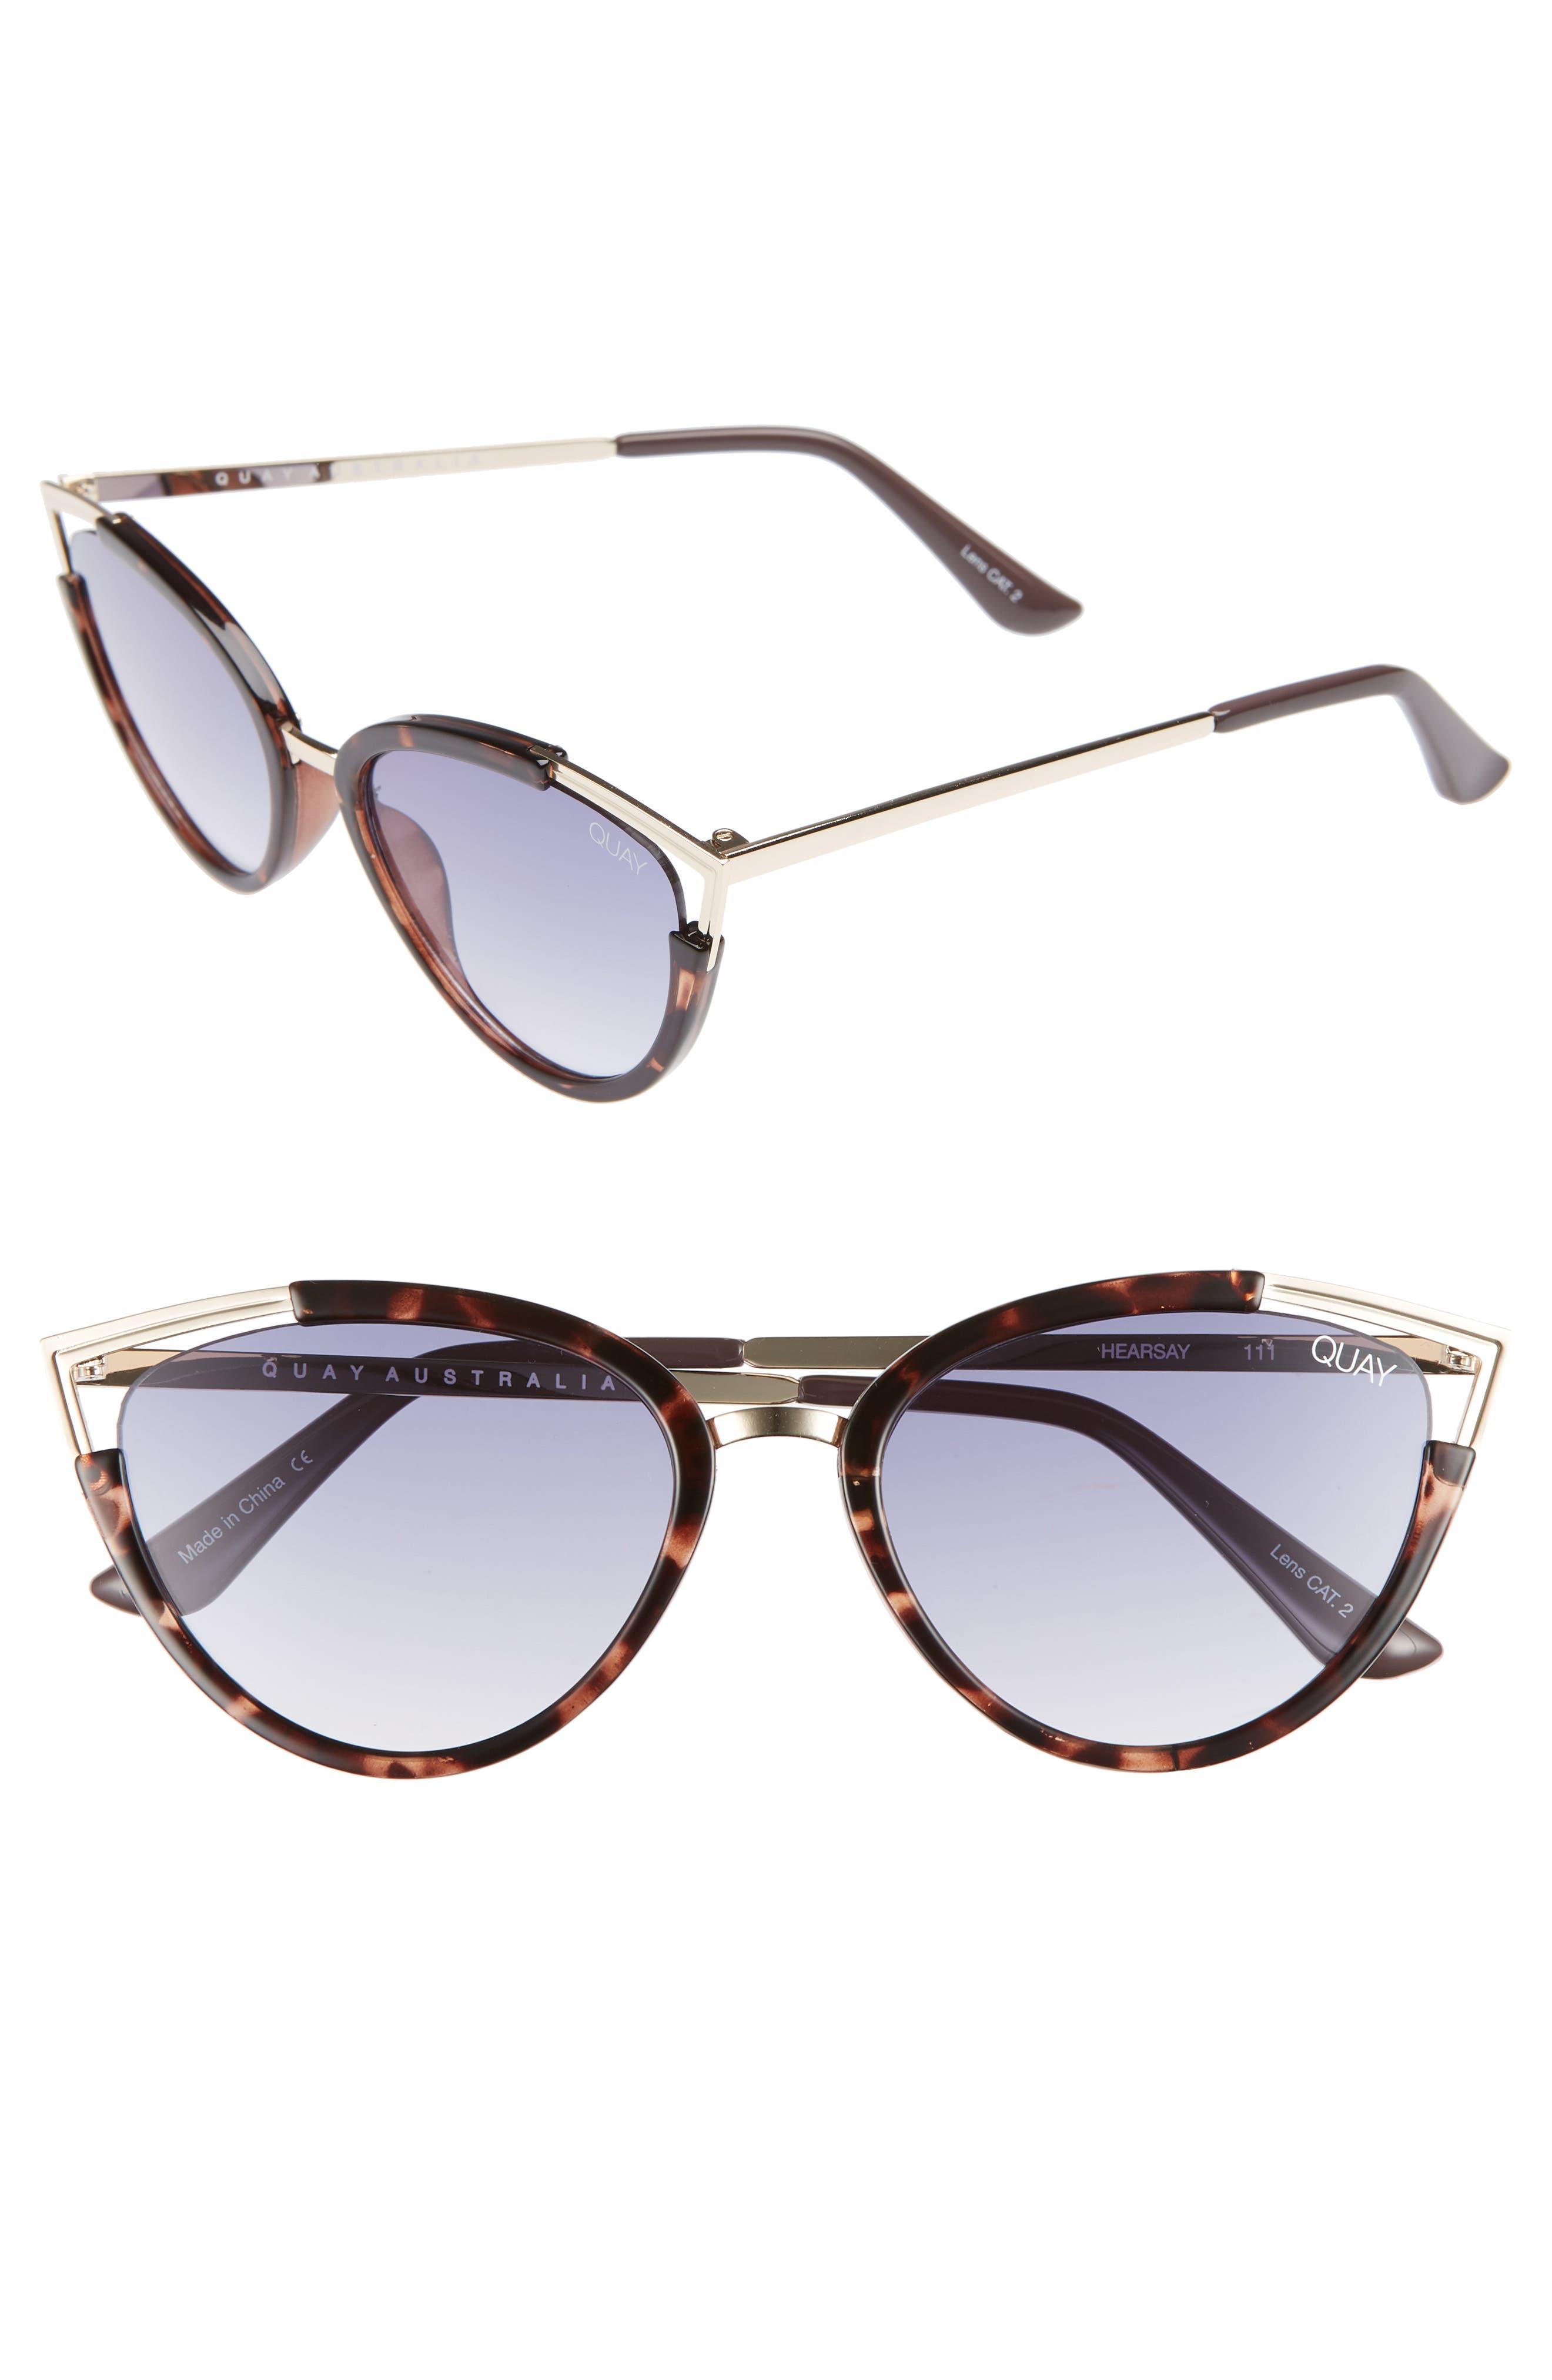 Hearsay 65mm Cat Eye Sunglasses,                         Main,                         color, TORT/ NAVY